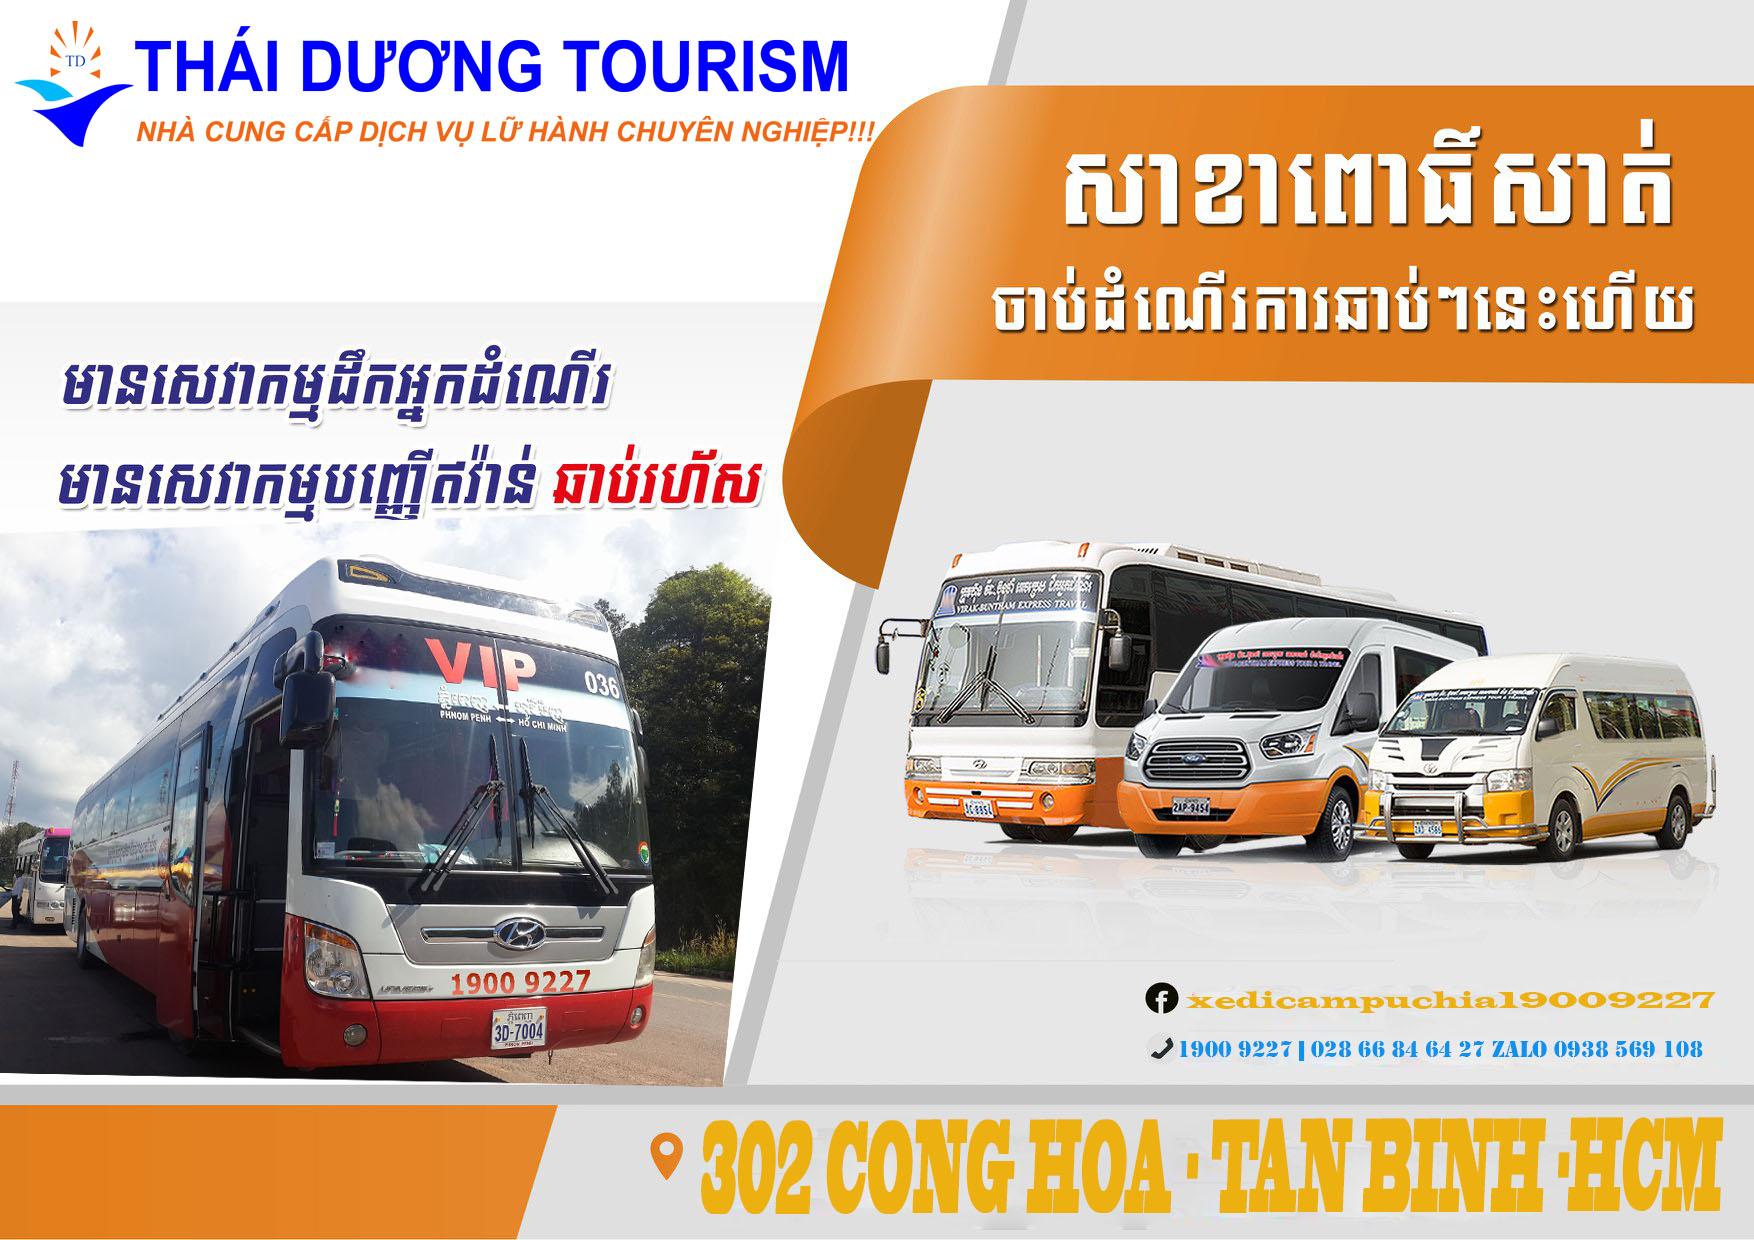 xe từ siem reap Sài gòn - Vé xe từ Sihanouk Ville về Sài Gòn